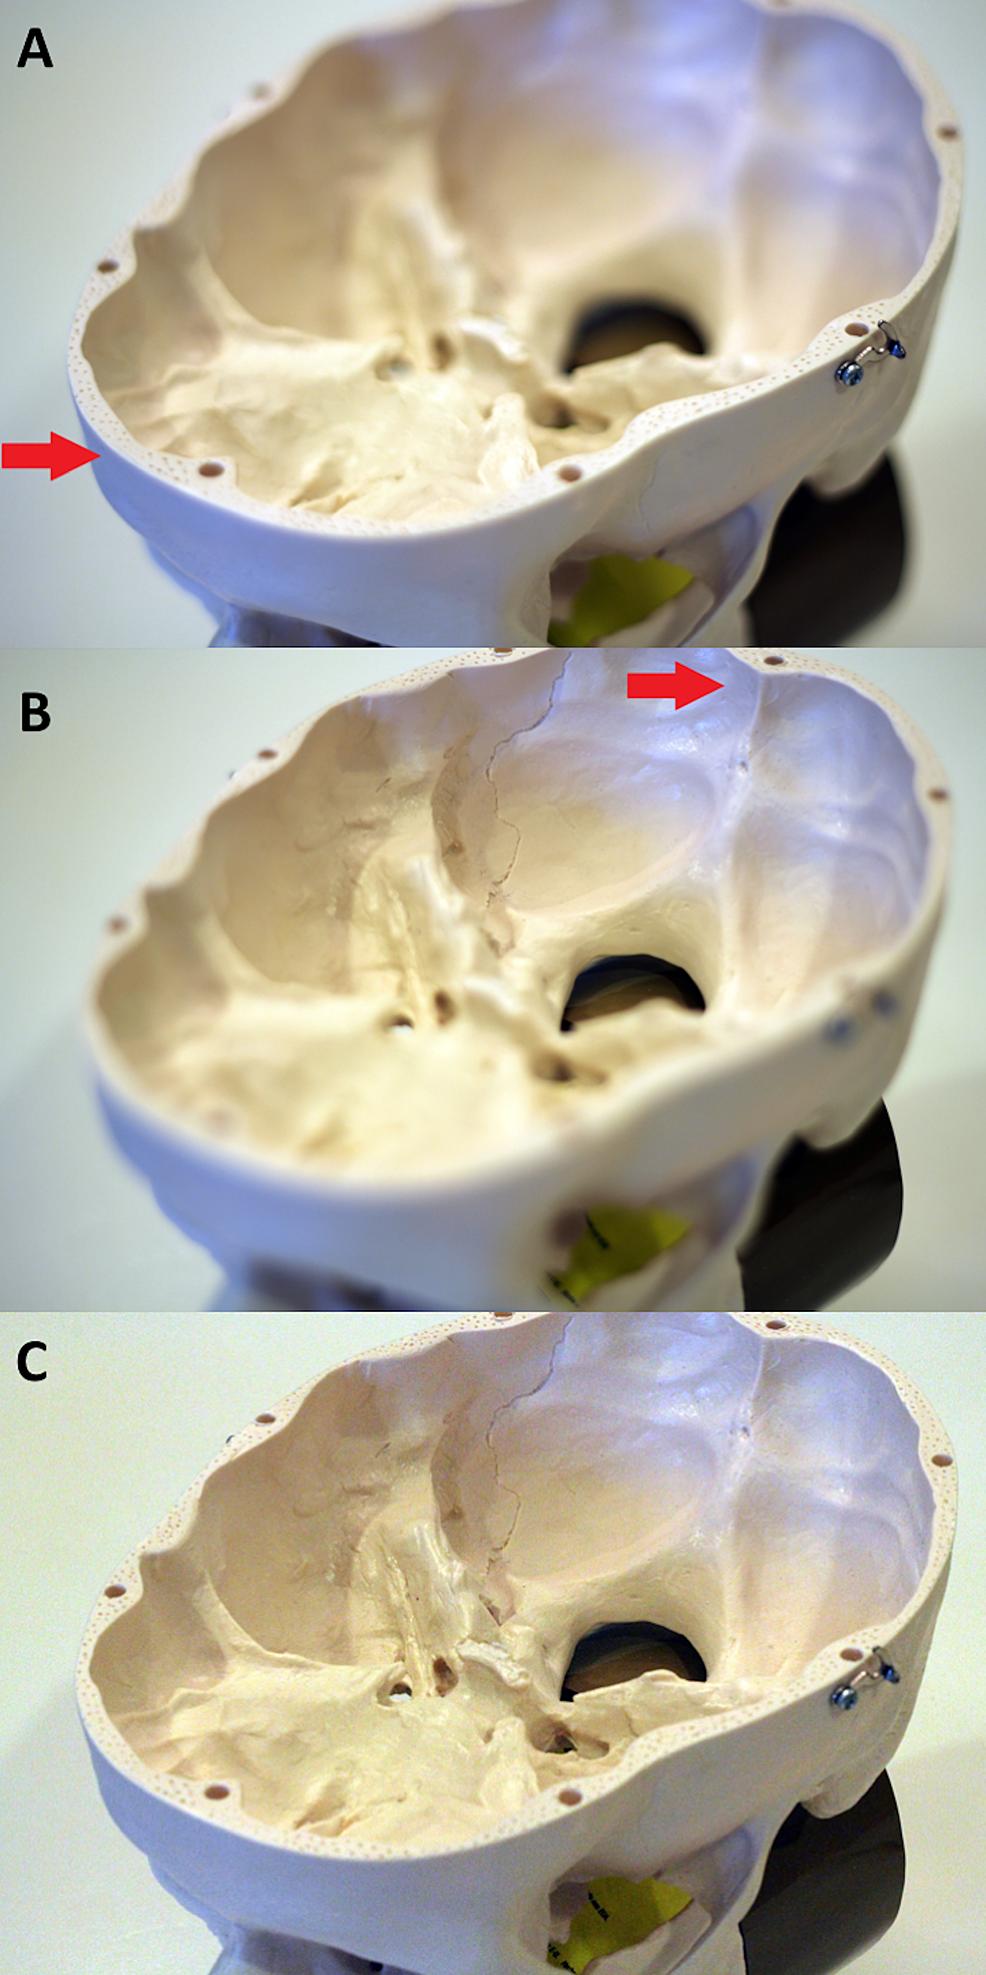 Skull-base-model-with-a-DSLR-camera